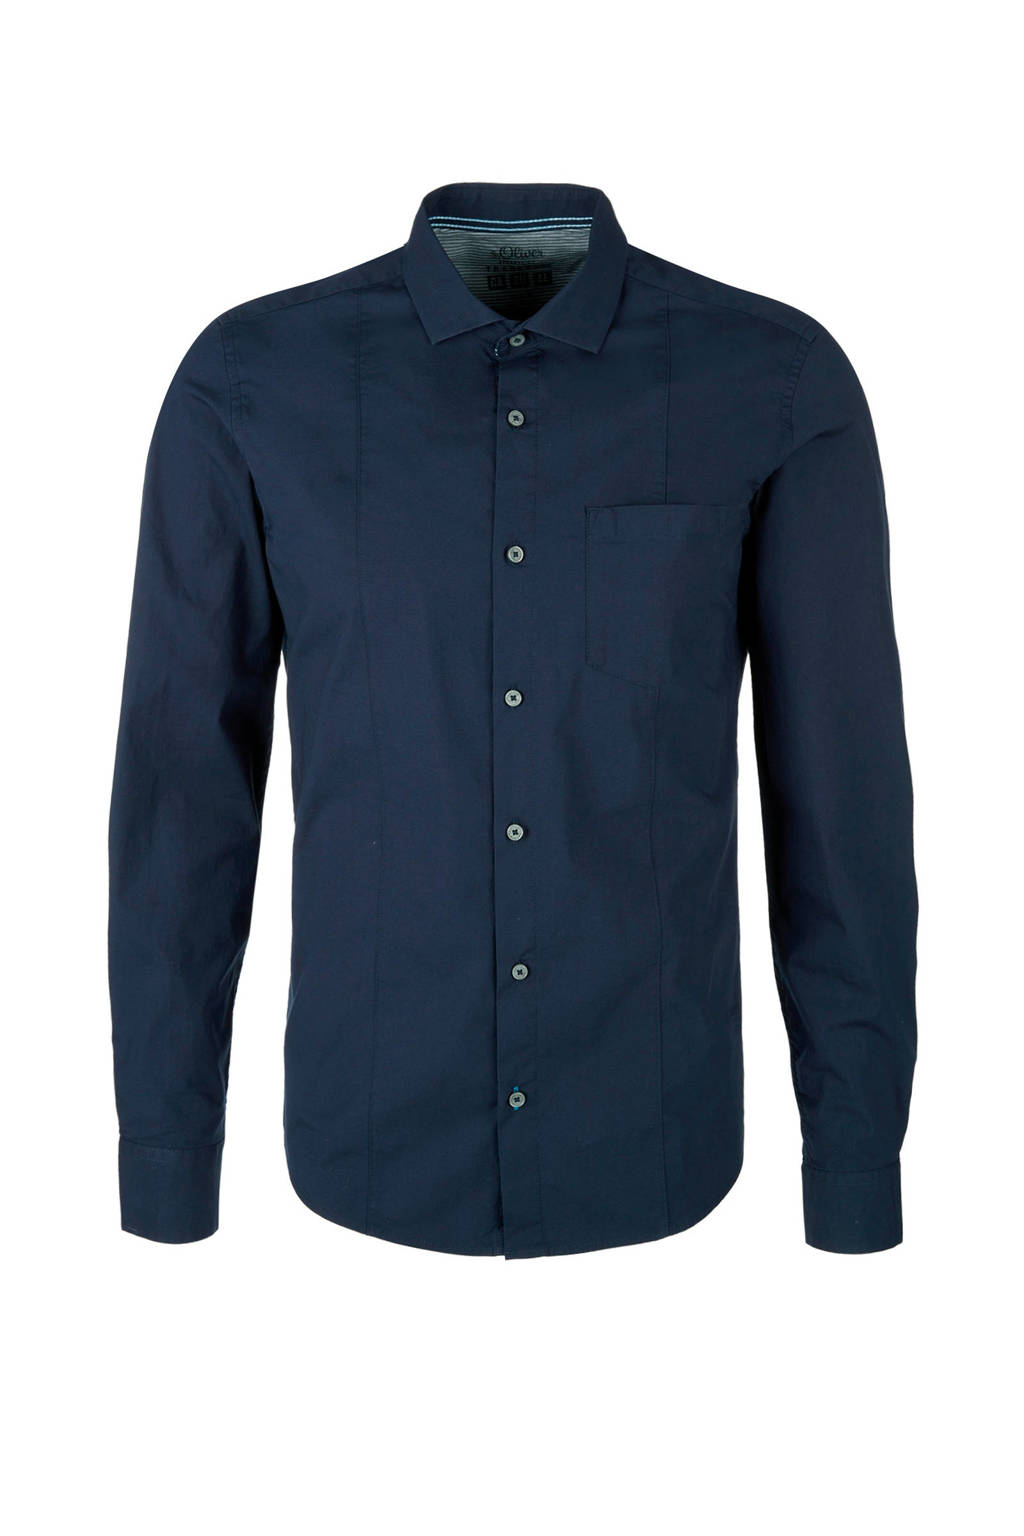 s.Oliver slim fit overhemd, Blauw